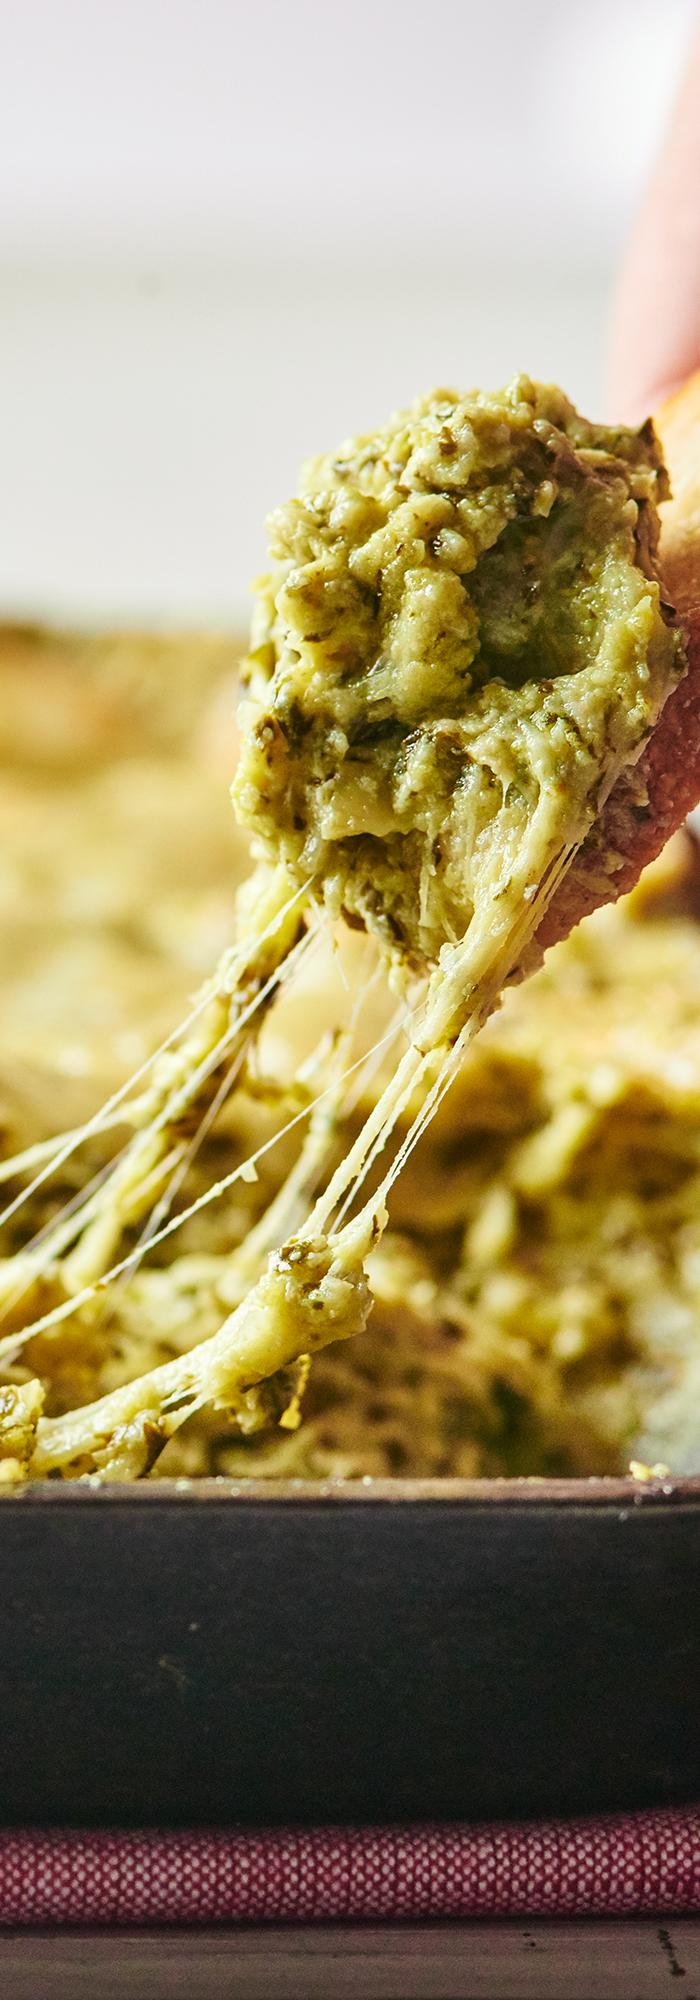 Broccoli Rabe Artichoke Dip